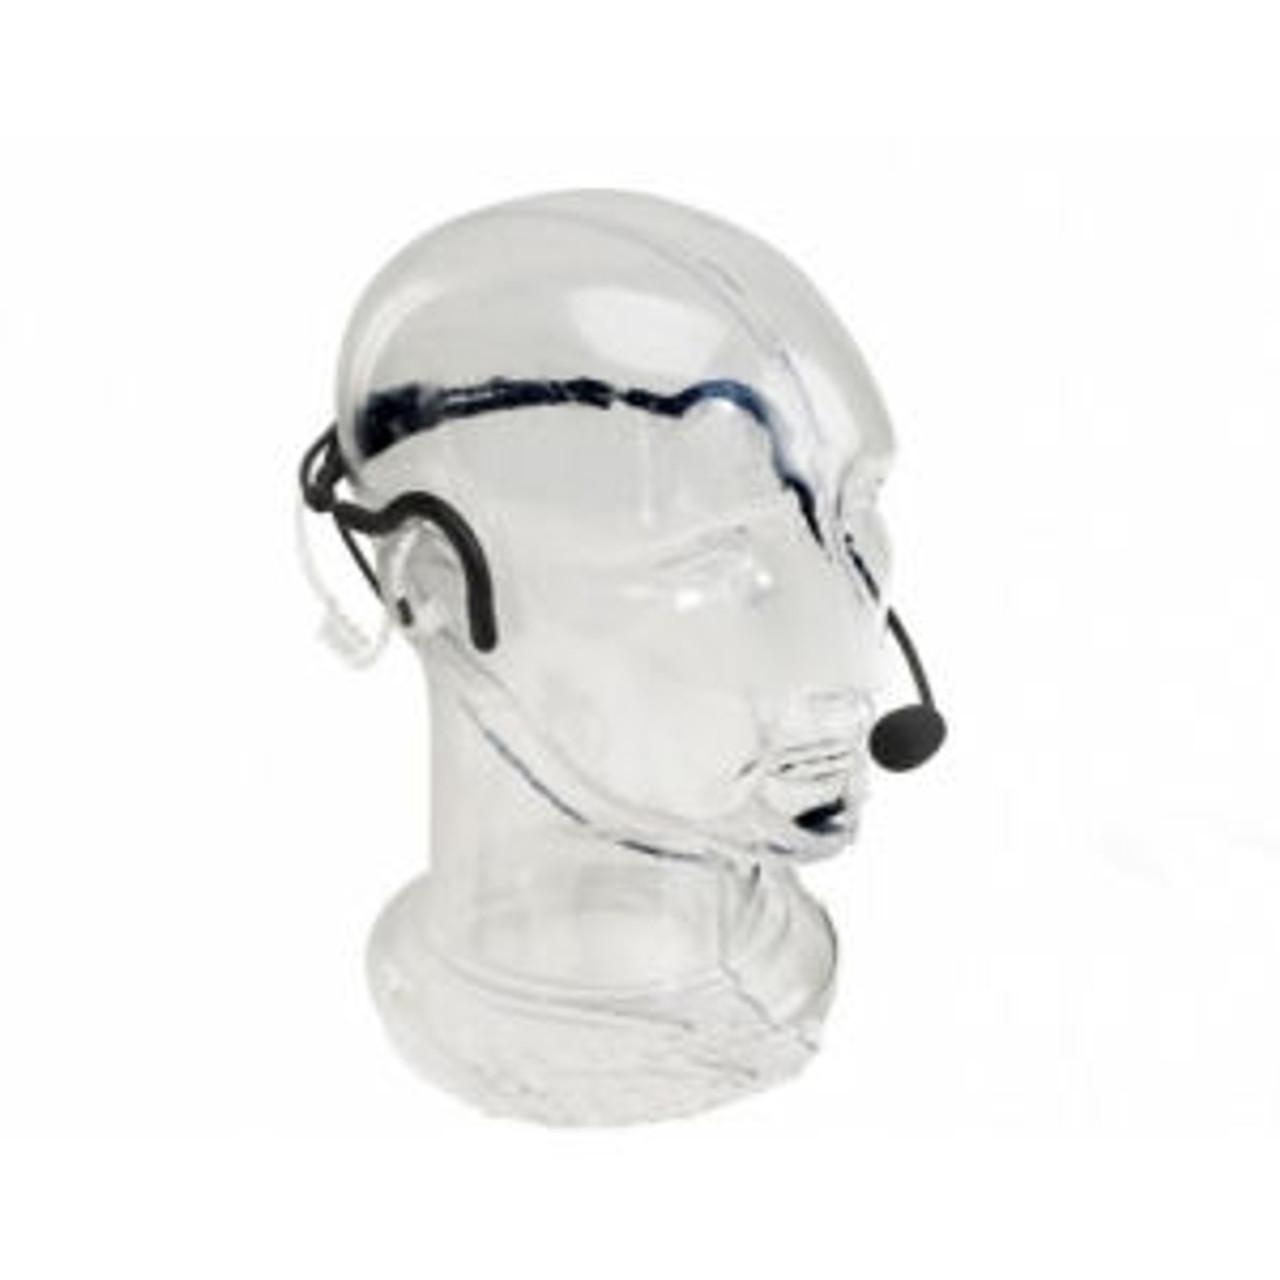 Harris P7350 Tactical Noise Canceling Dual Acoustic Tube Headset